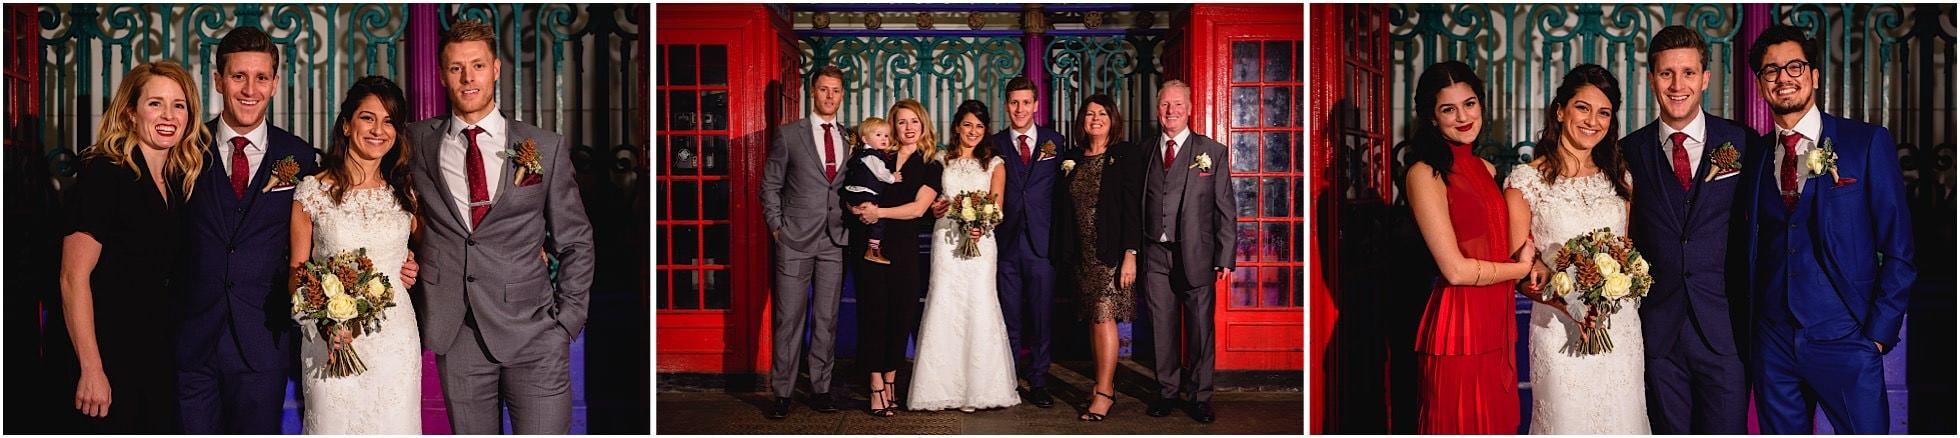 Group wedding photos at smithfield market